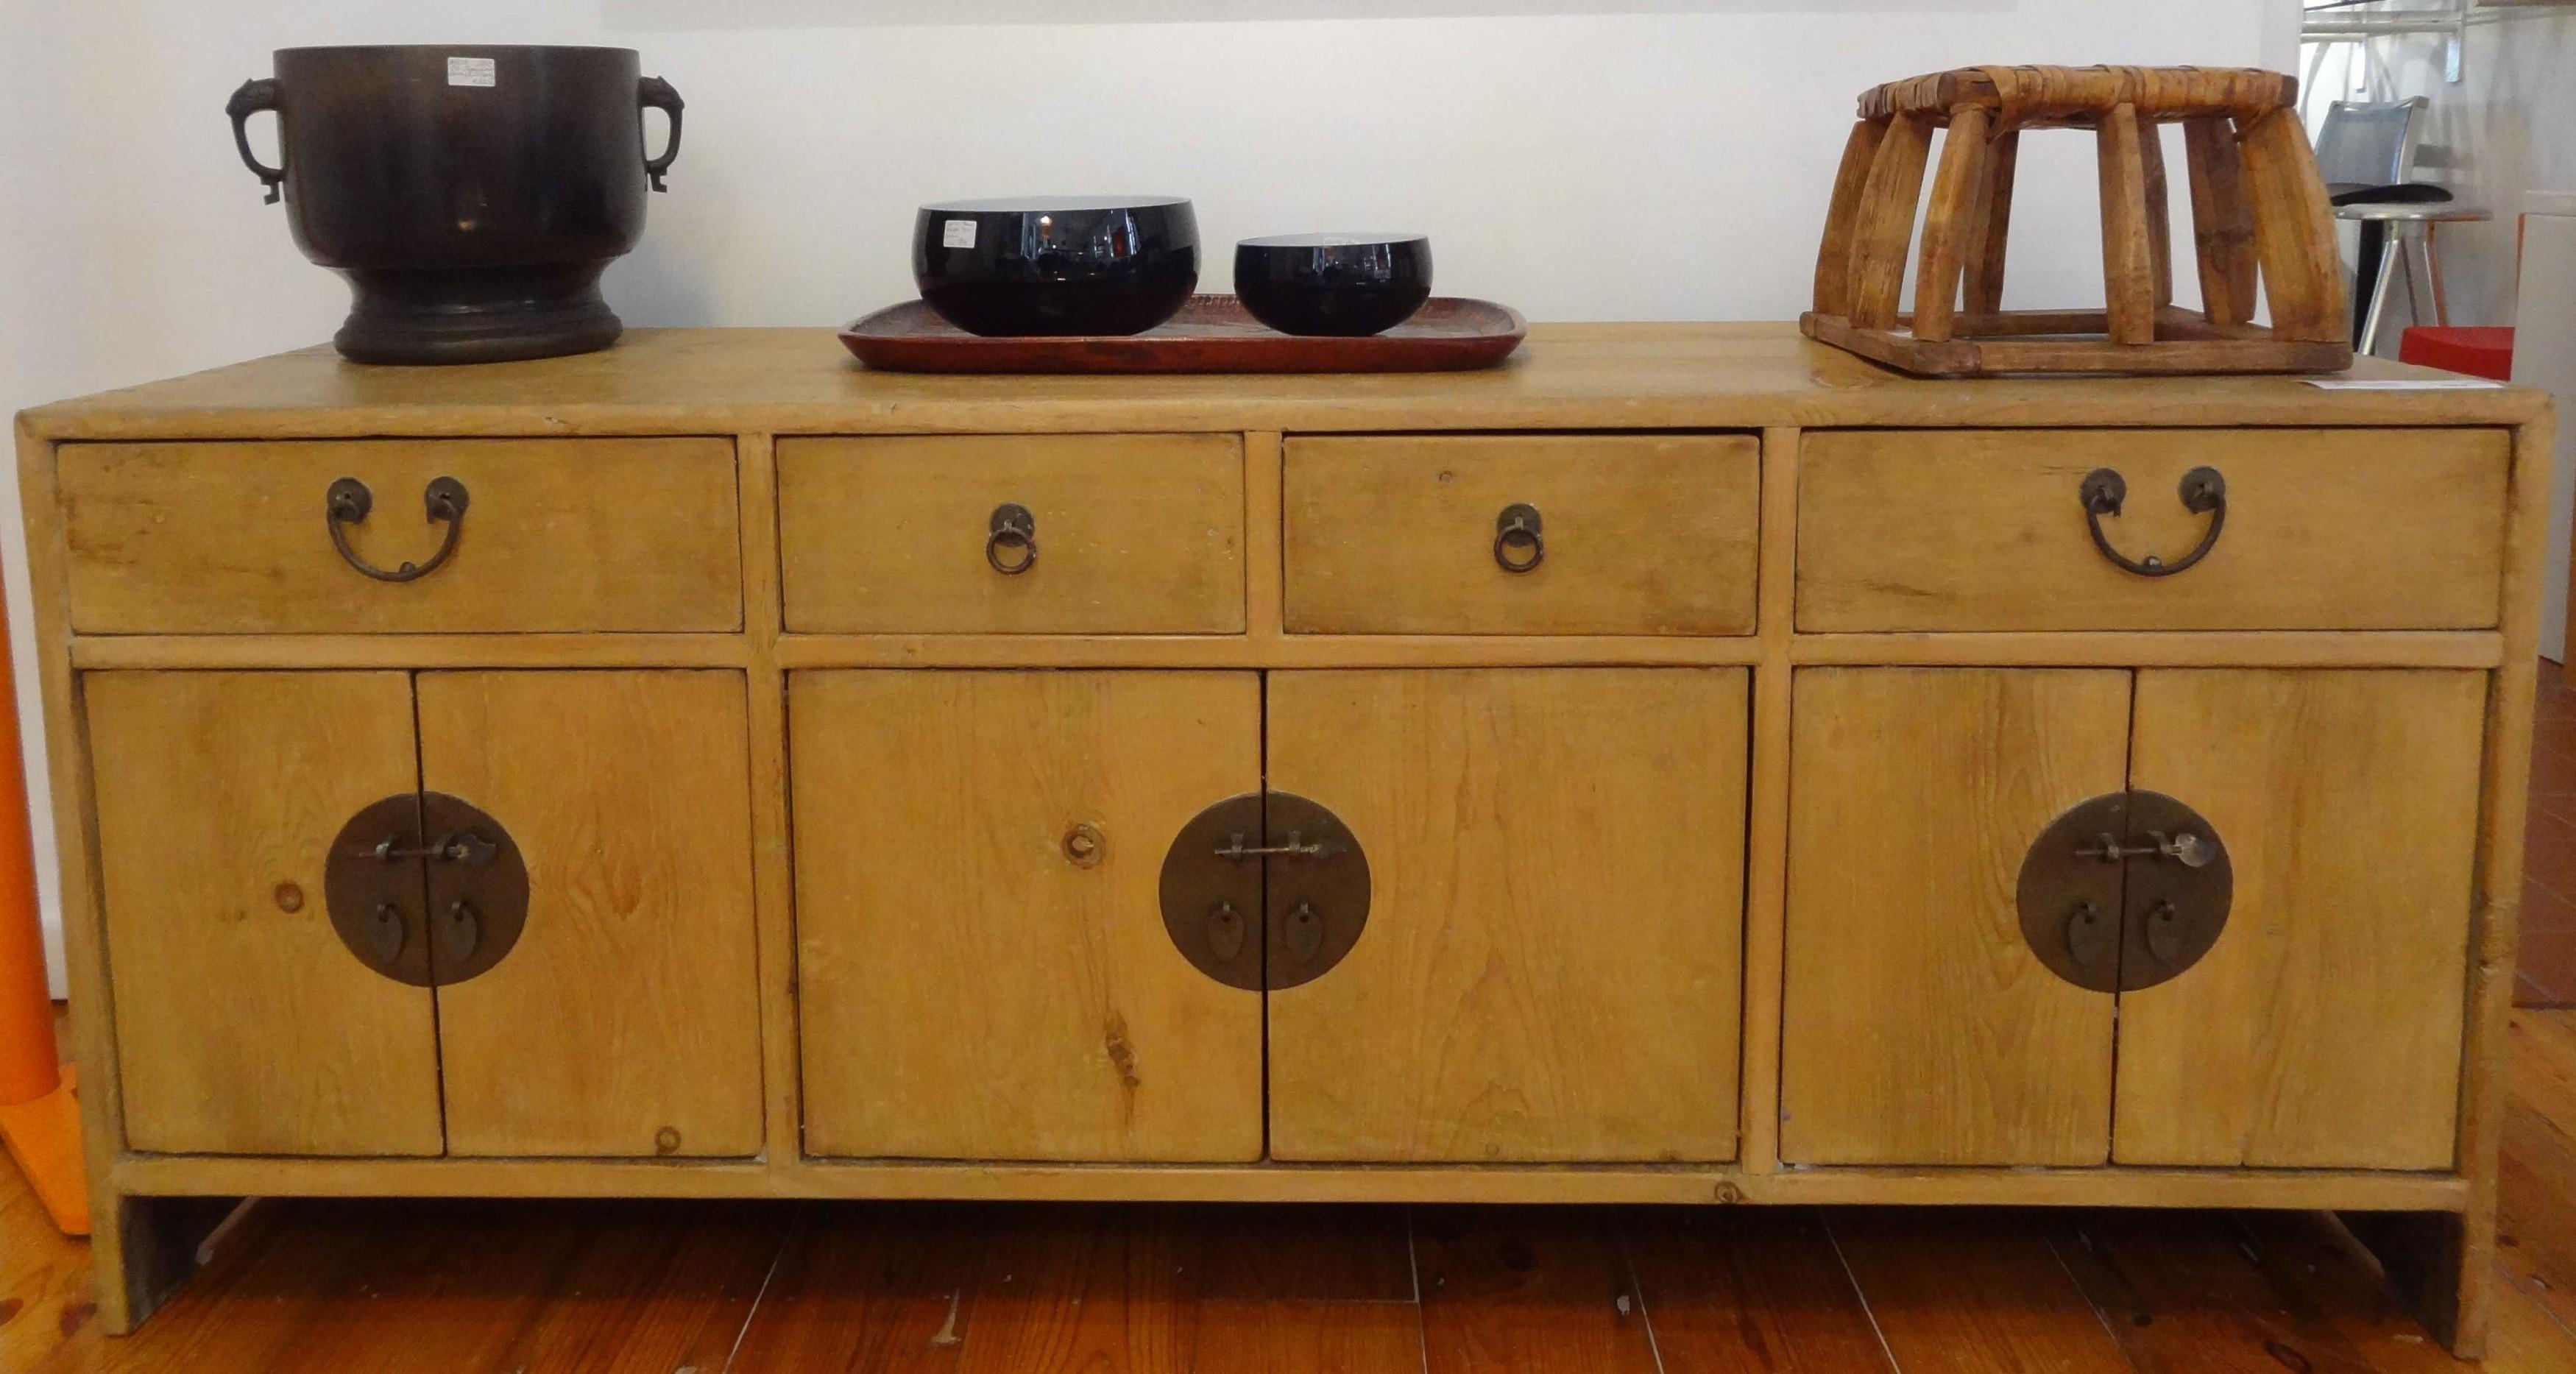 Antique Sideboards | Gallery Categories | Aptos Cruz Inside Latest Antique Walnut Finish 2 Door/4 Drawer Sideboards (#1 of 20)